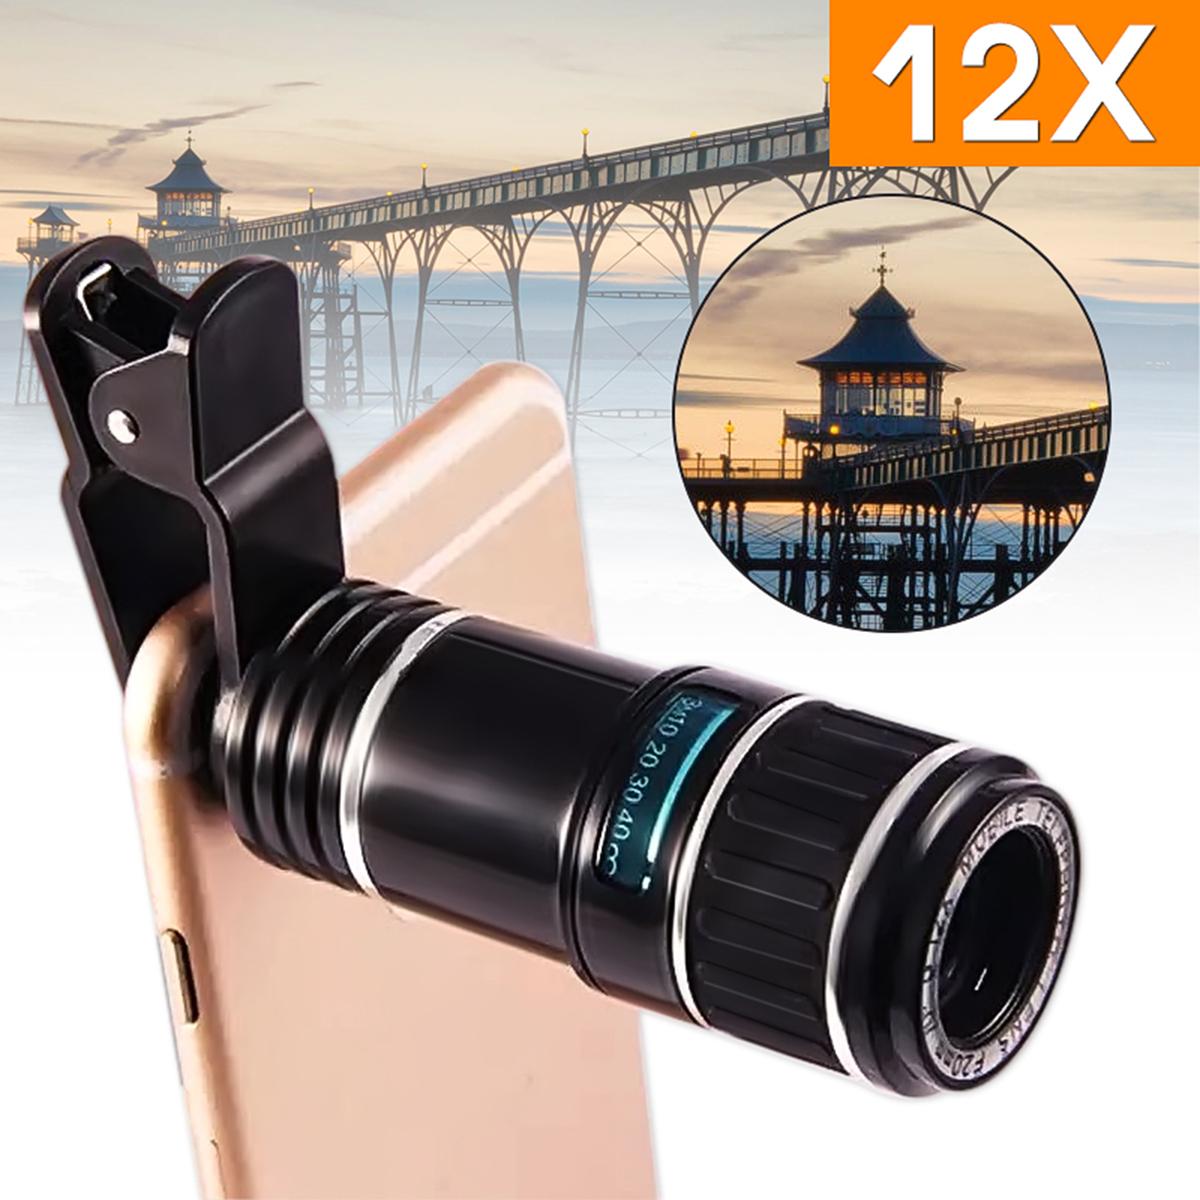 12X-Universel-Telescope-Monoculaire-Objectif-Lentille-Clip-Telephone-Pr-iPhone-X